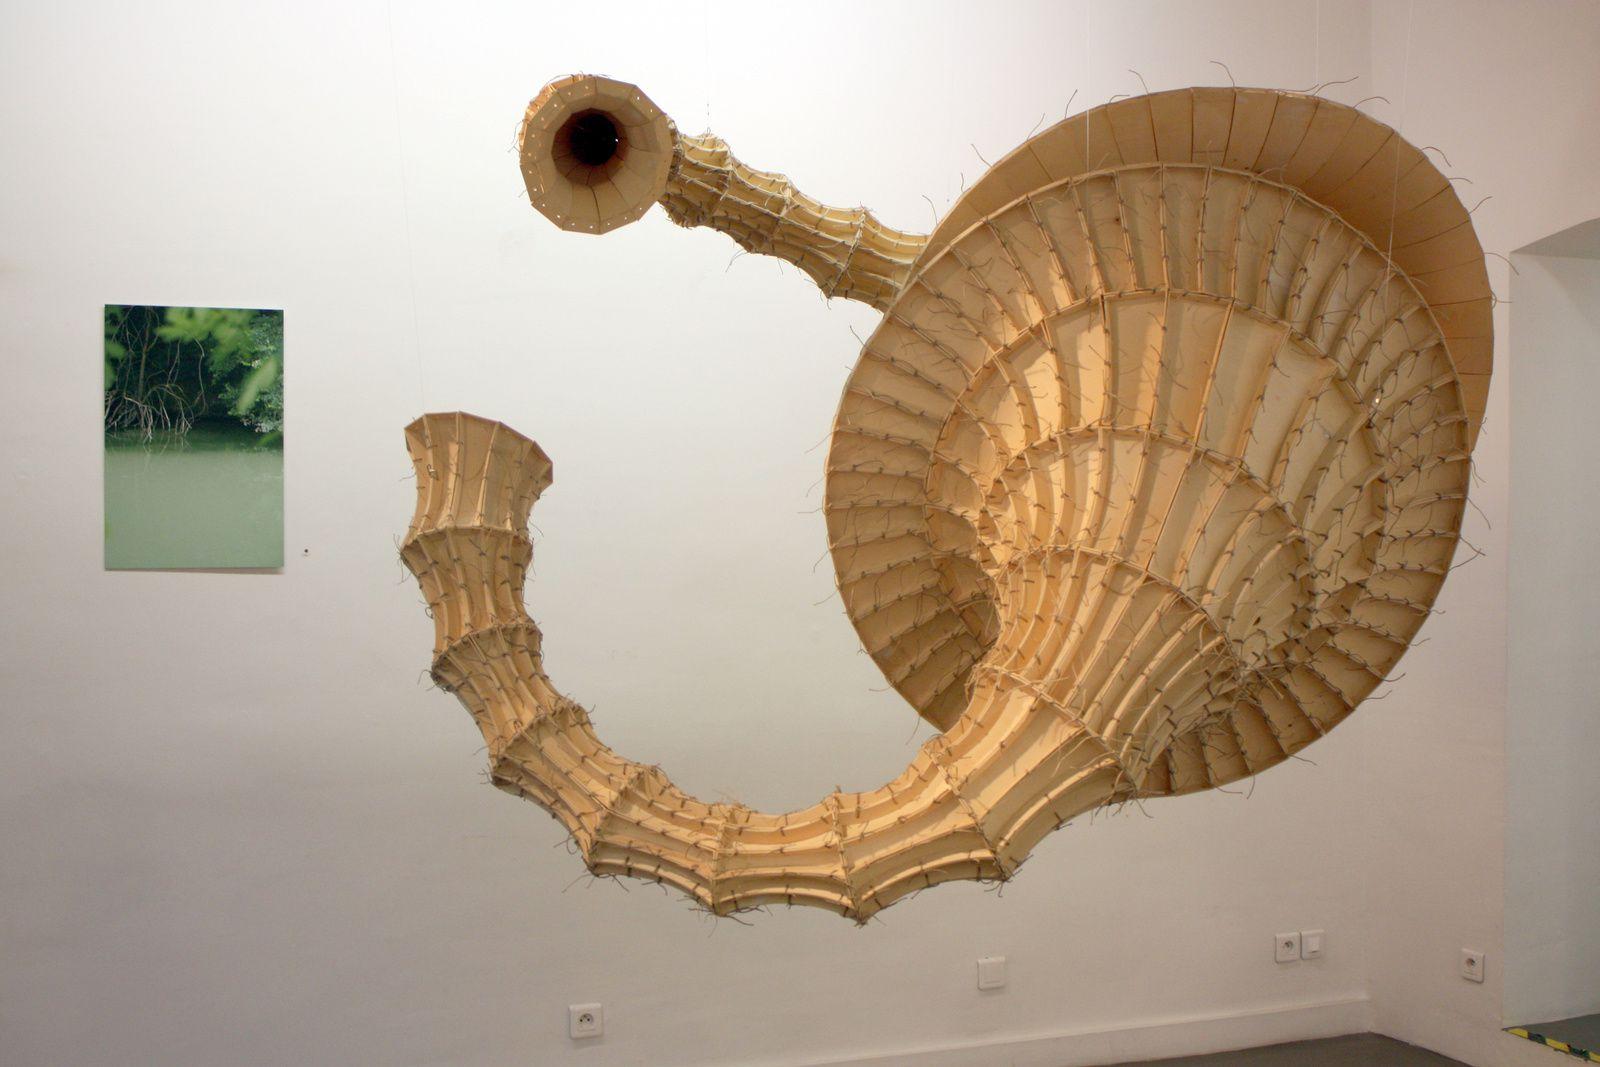 Moule vierge, 2013-2014 de Konrad LODER